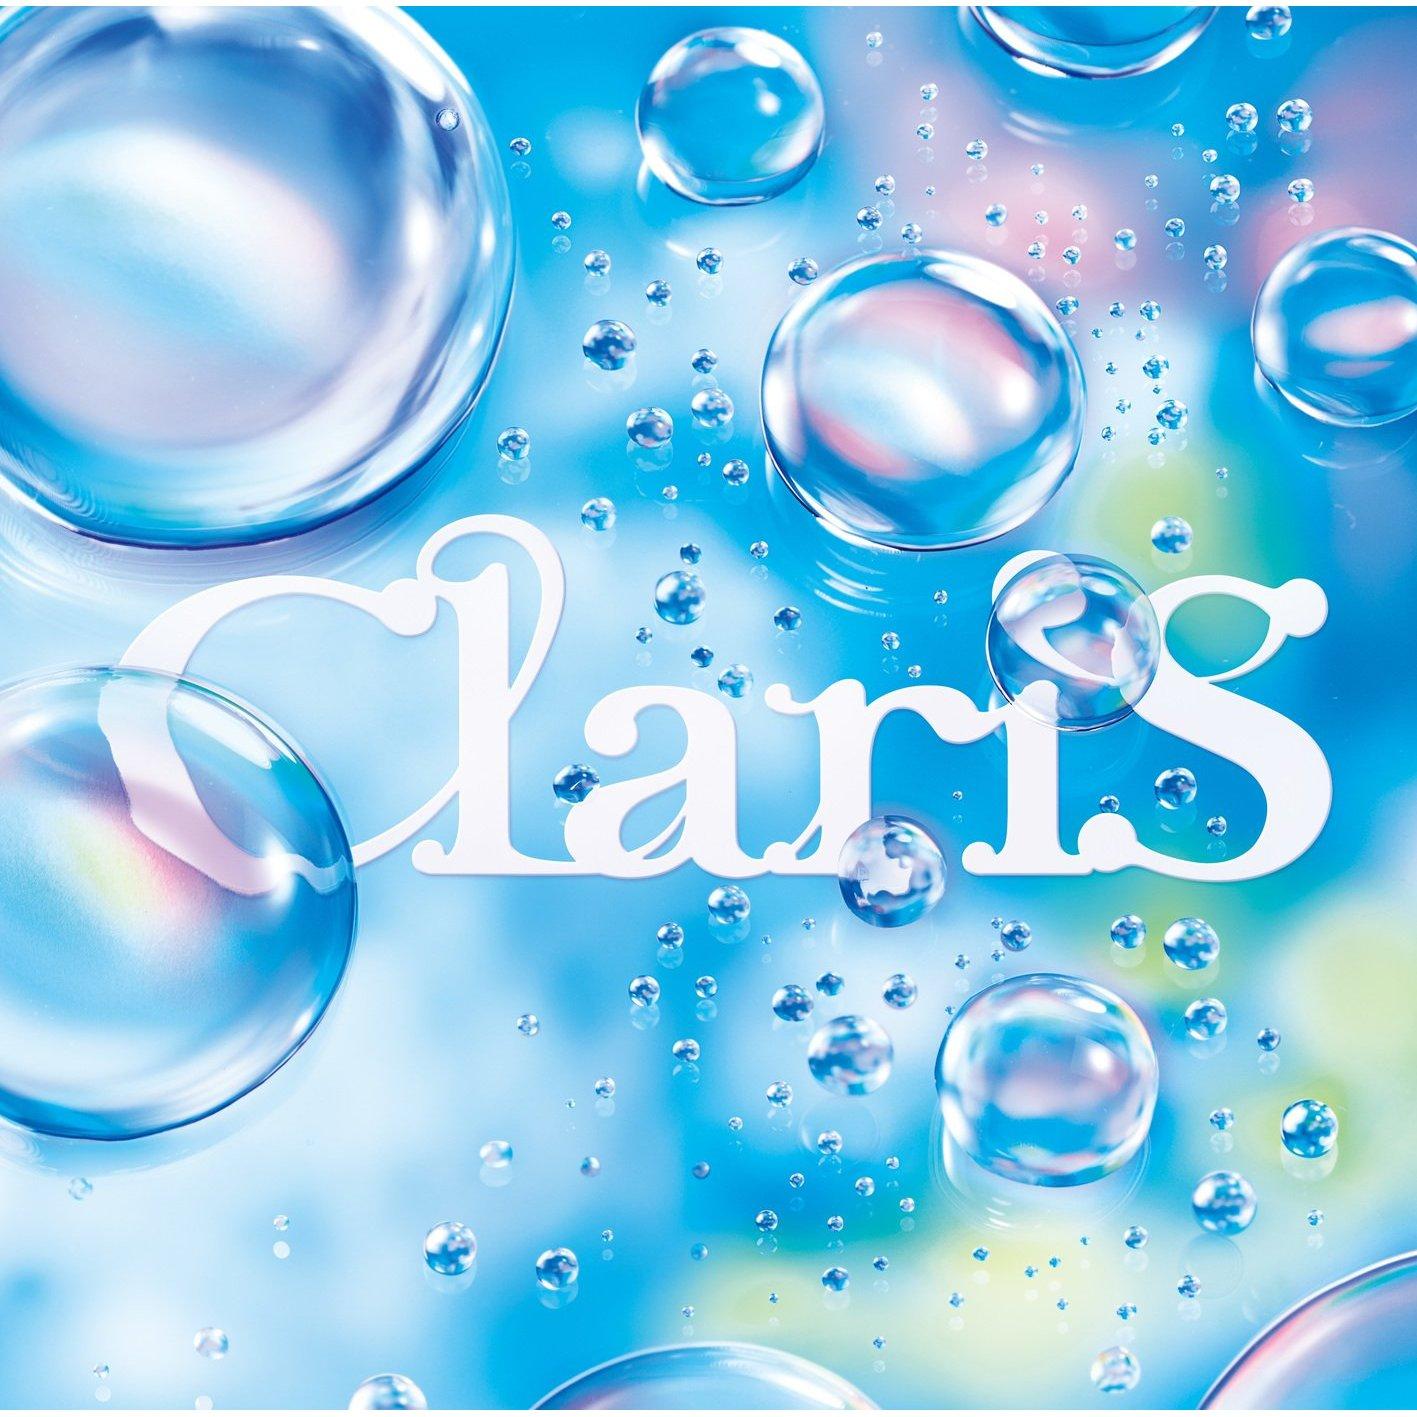 20160820.02.24 ClariS - Gravity cover 1.jpg